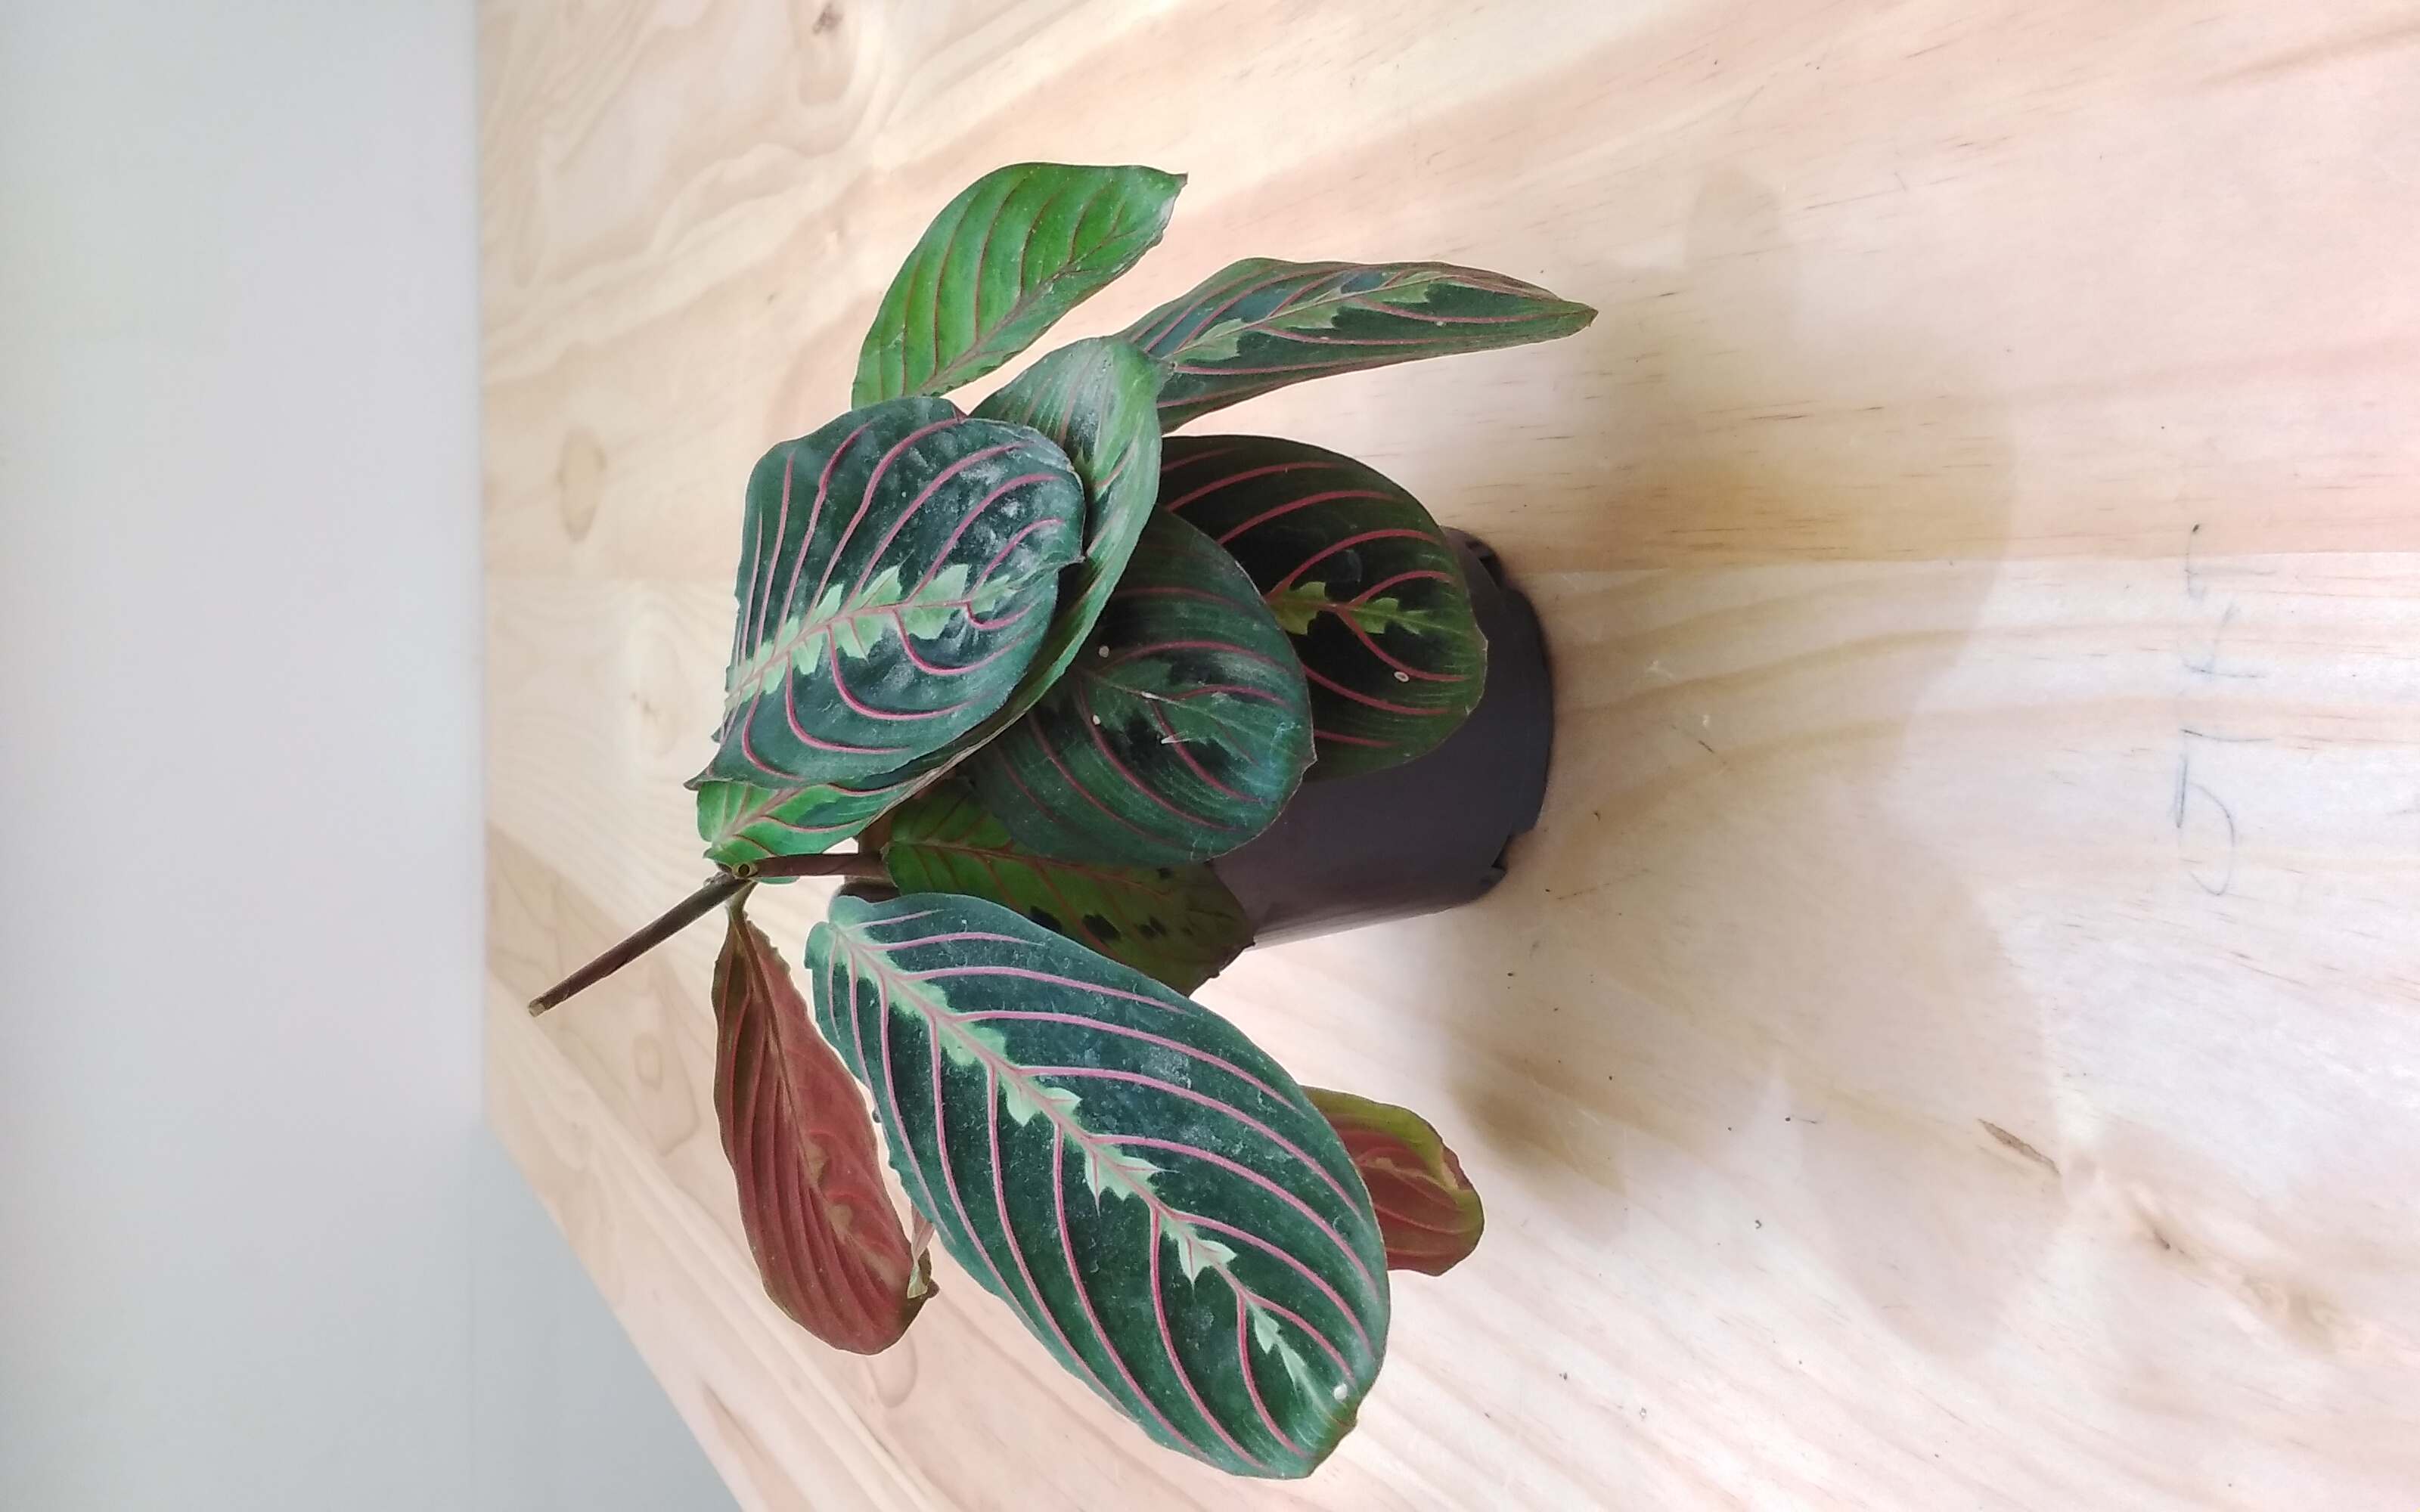 Maranta Leuconeura 'Indoor Plants'